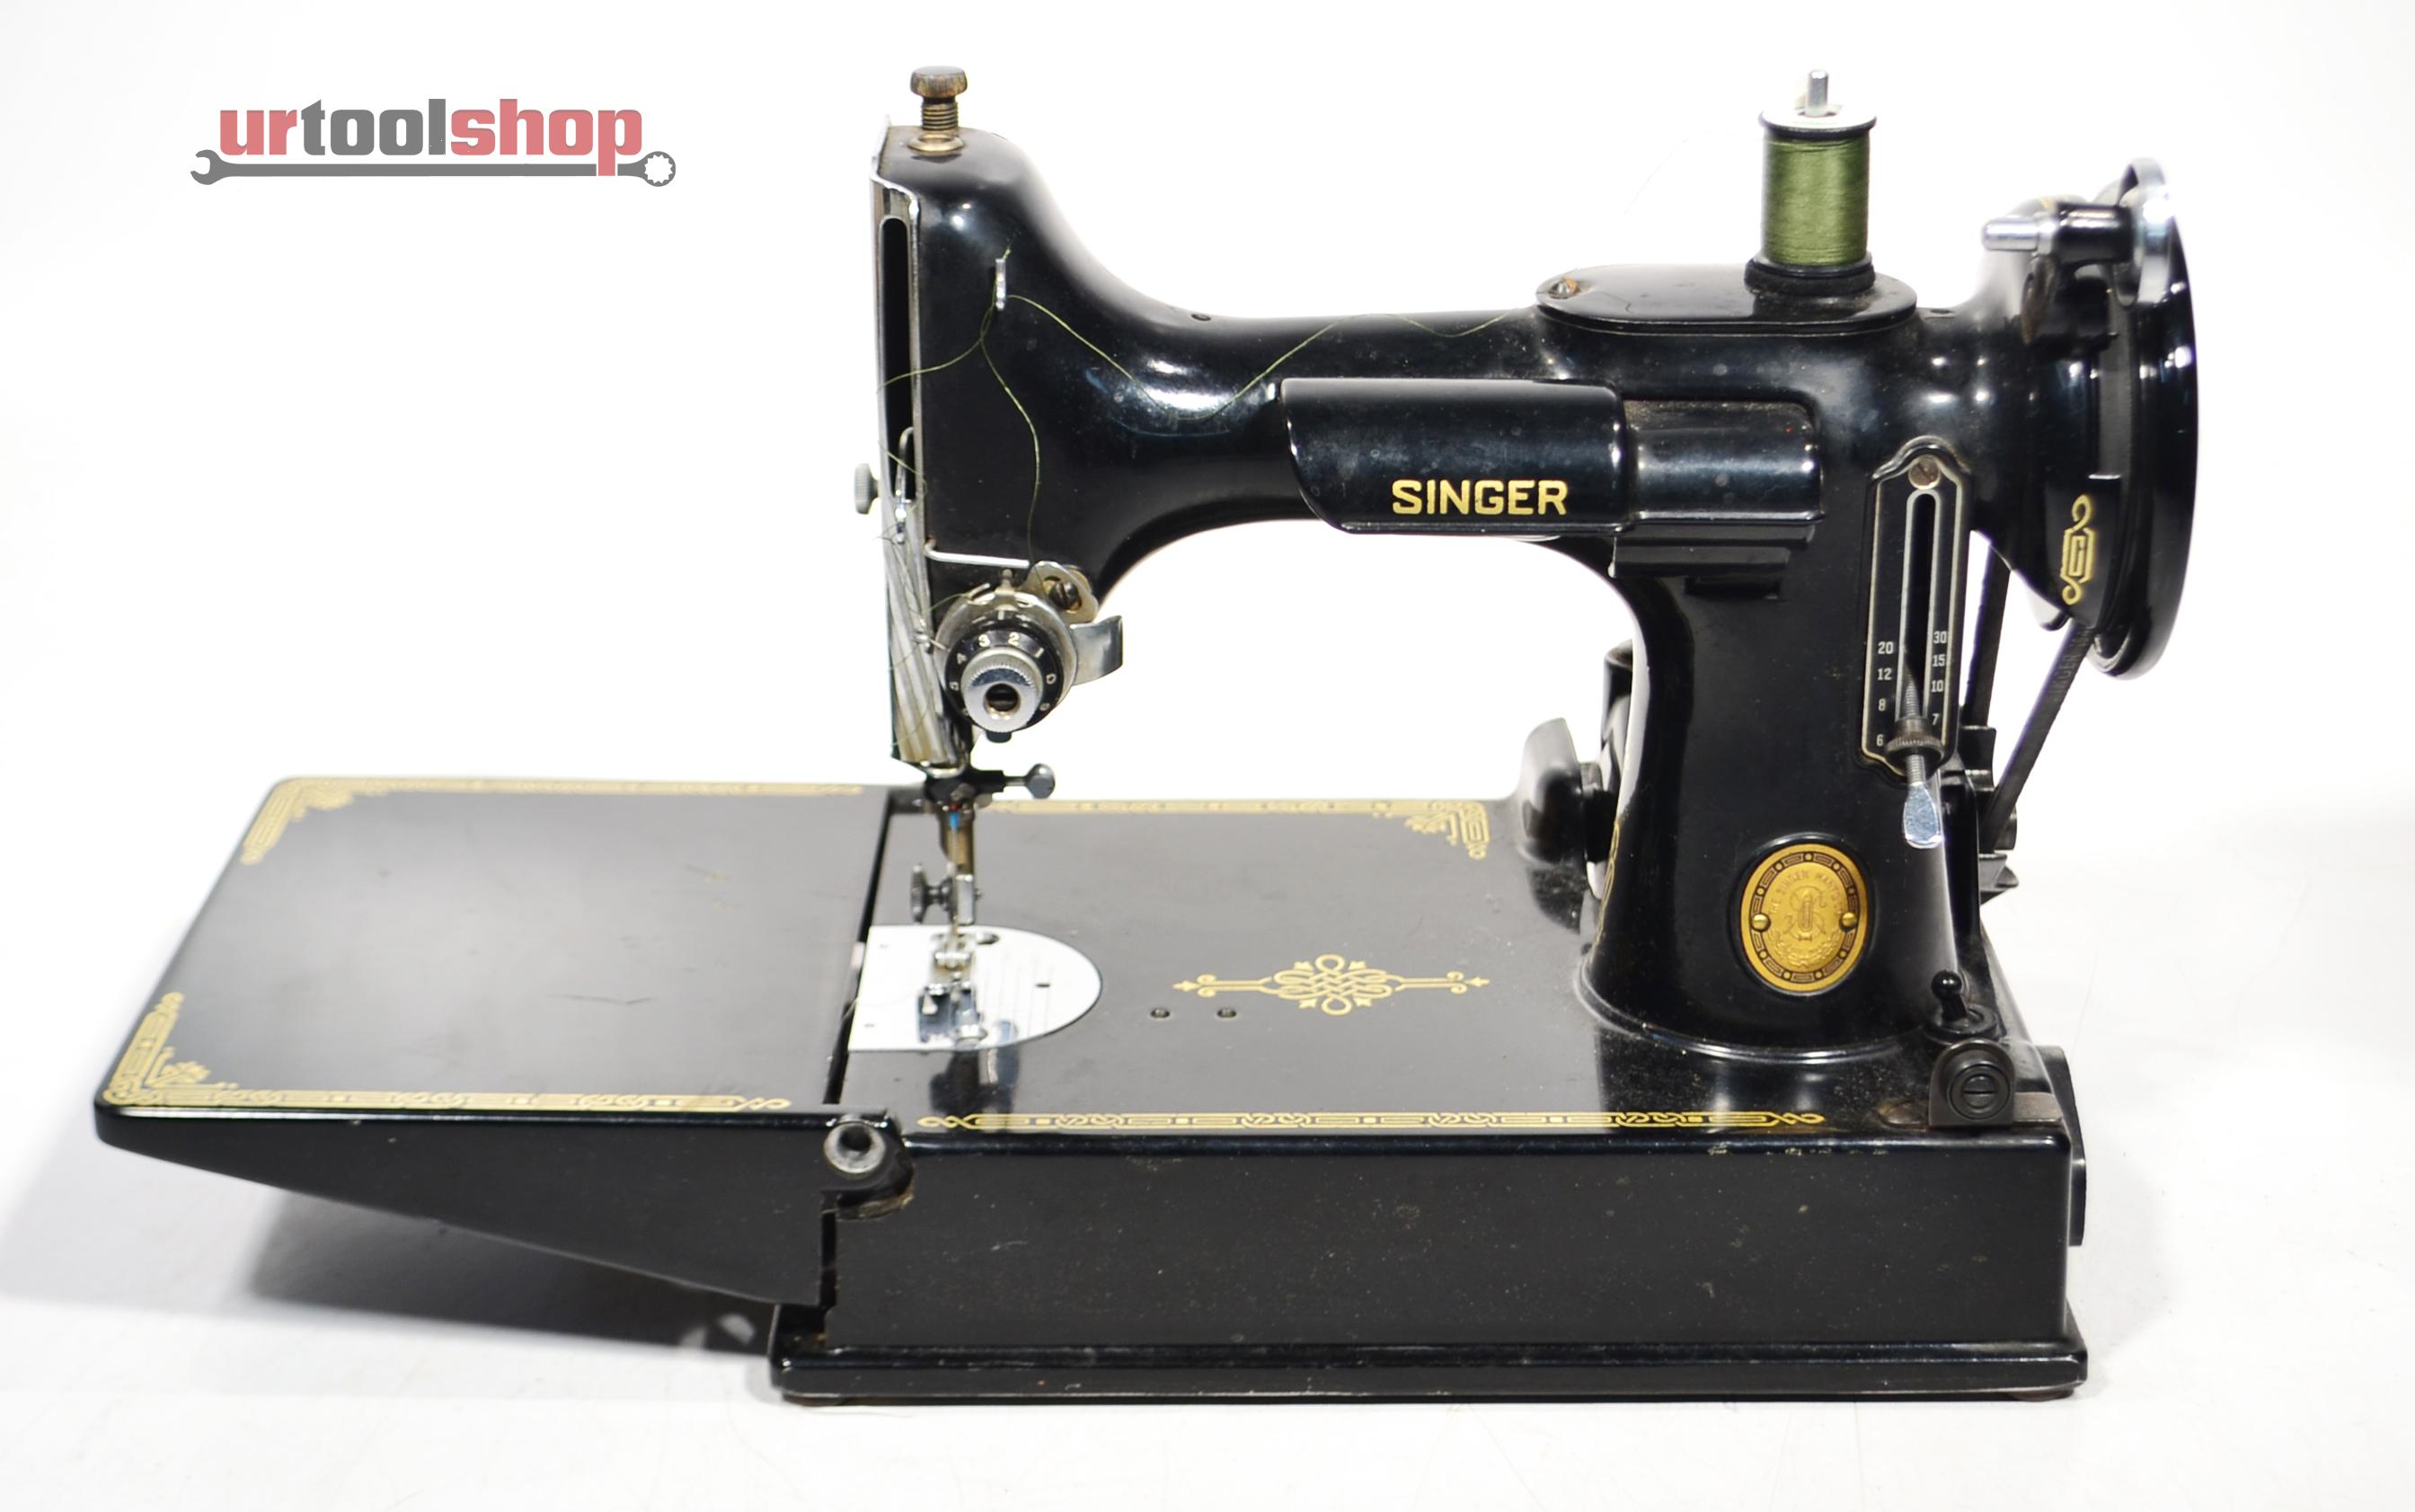 Vintage Singer Sewing Machine 2211 8987464  eBay